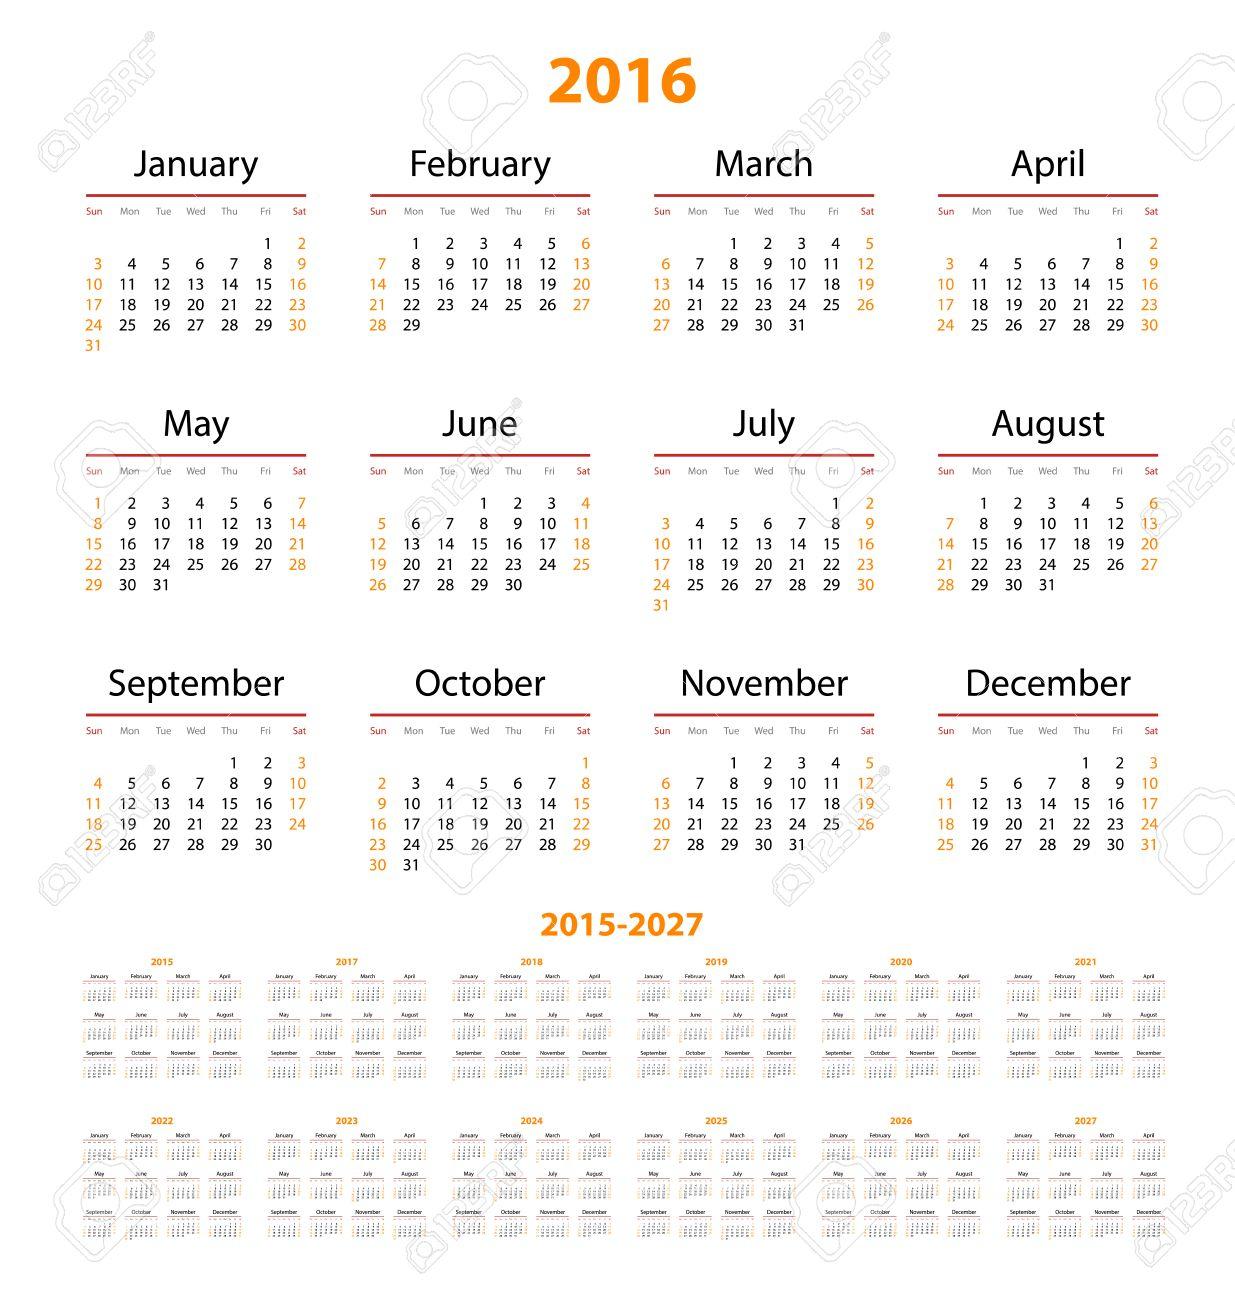 Calendar 2015, 2016, 2017, 2018, 2019, 2020, 2021, 2022, 2023